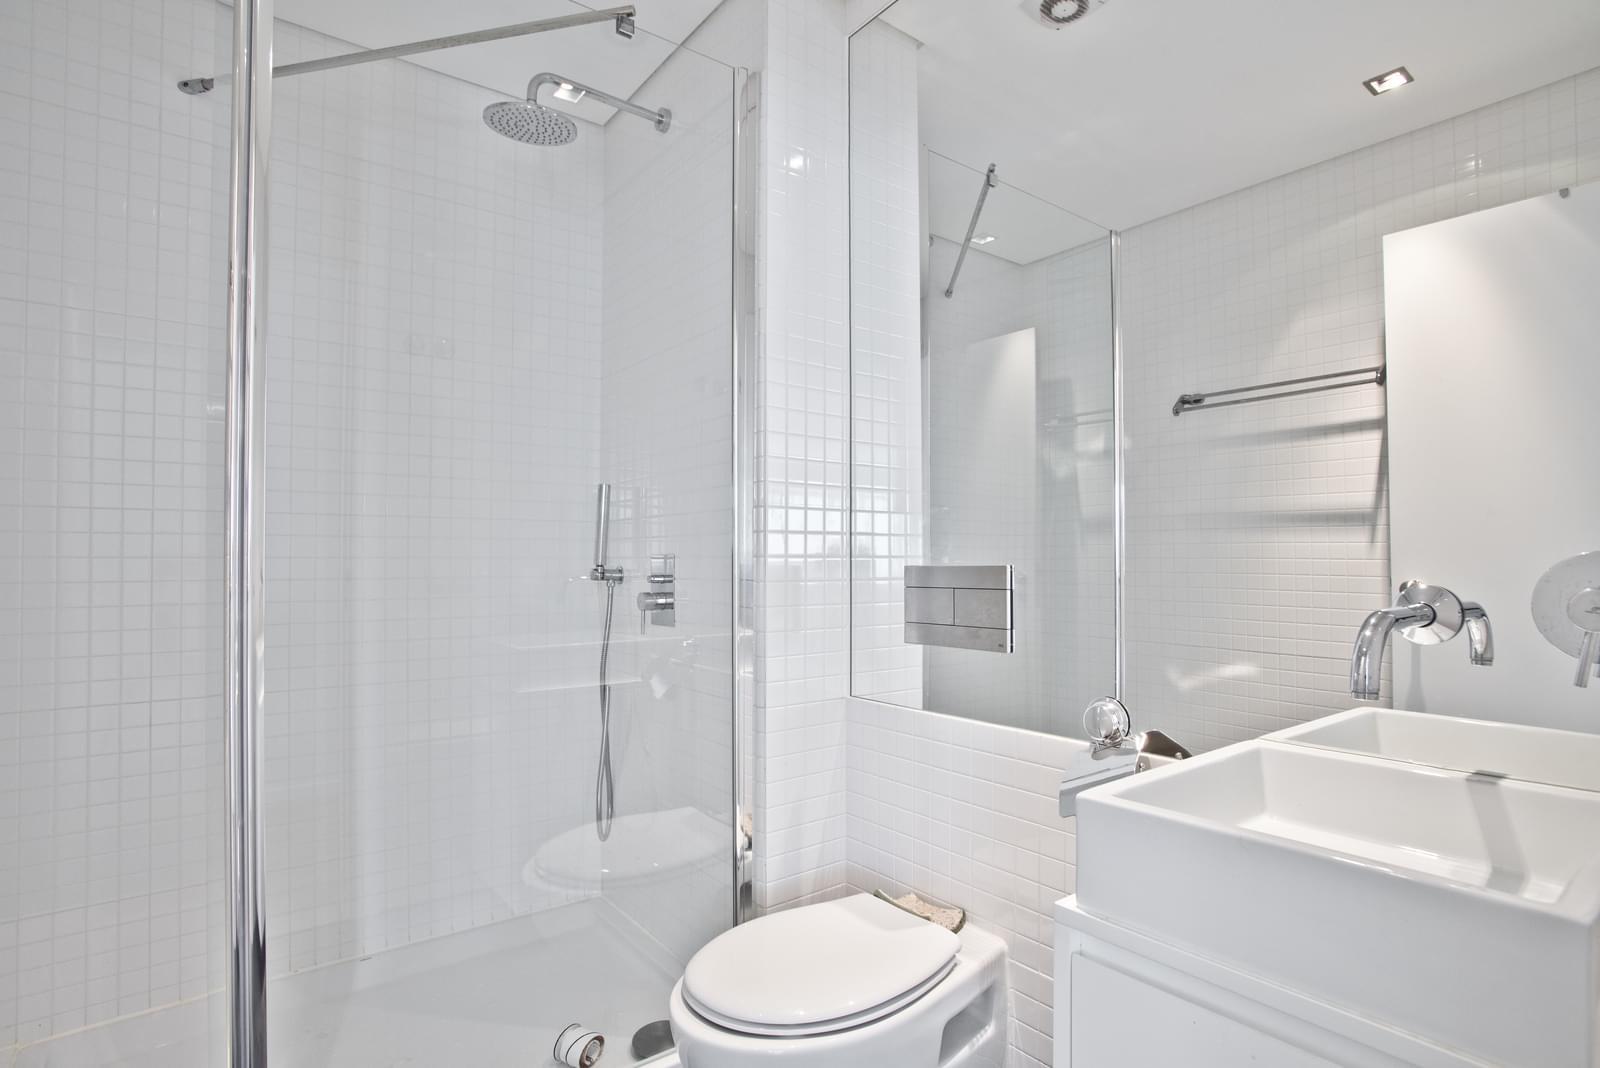 pf13975-apartamento-t4-oeiras-10c23bf3-aa6c-4361-bc0f-b7cb223a1e18